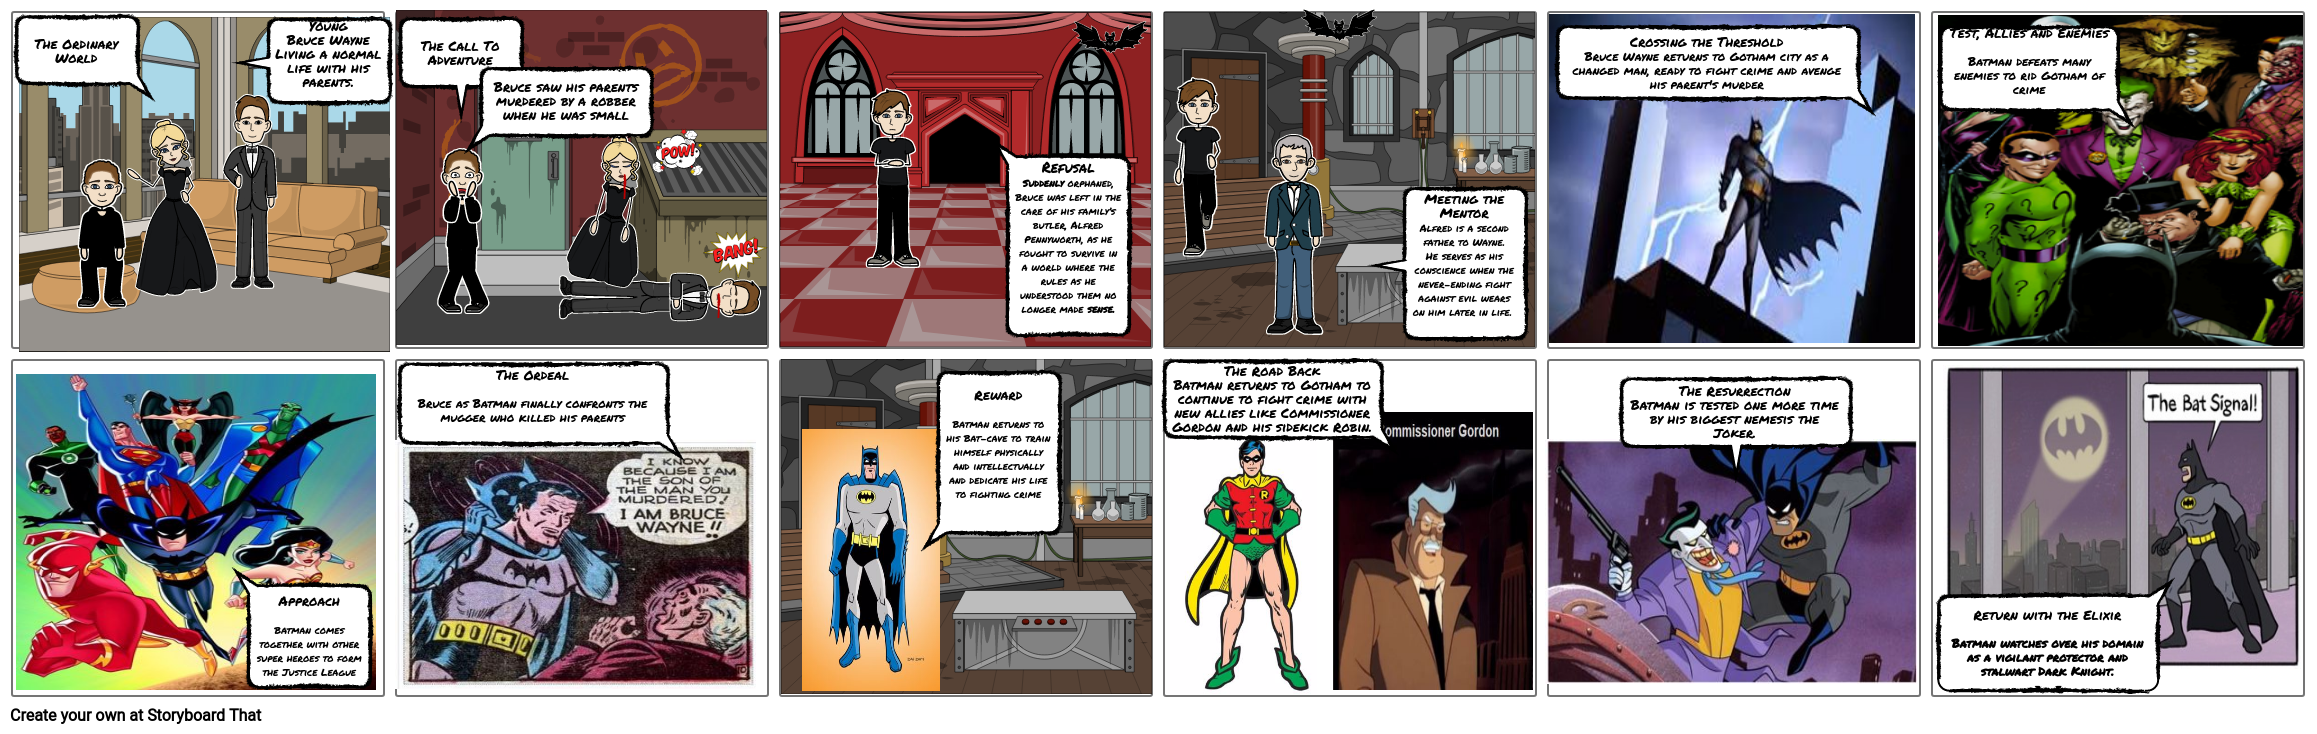 Batman: A Hero's Journey